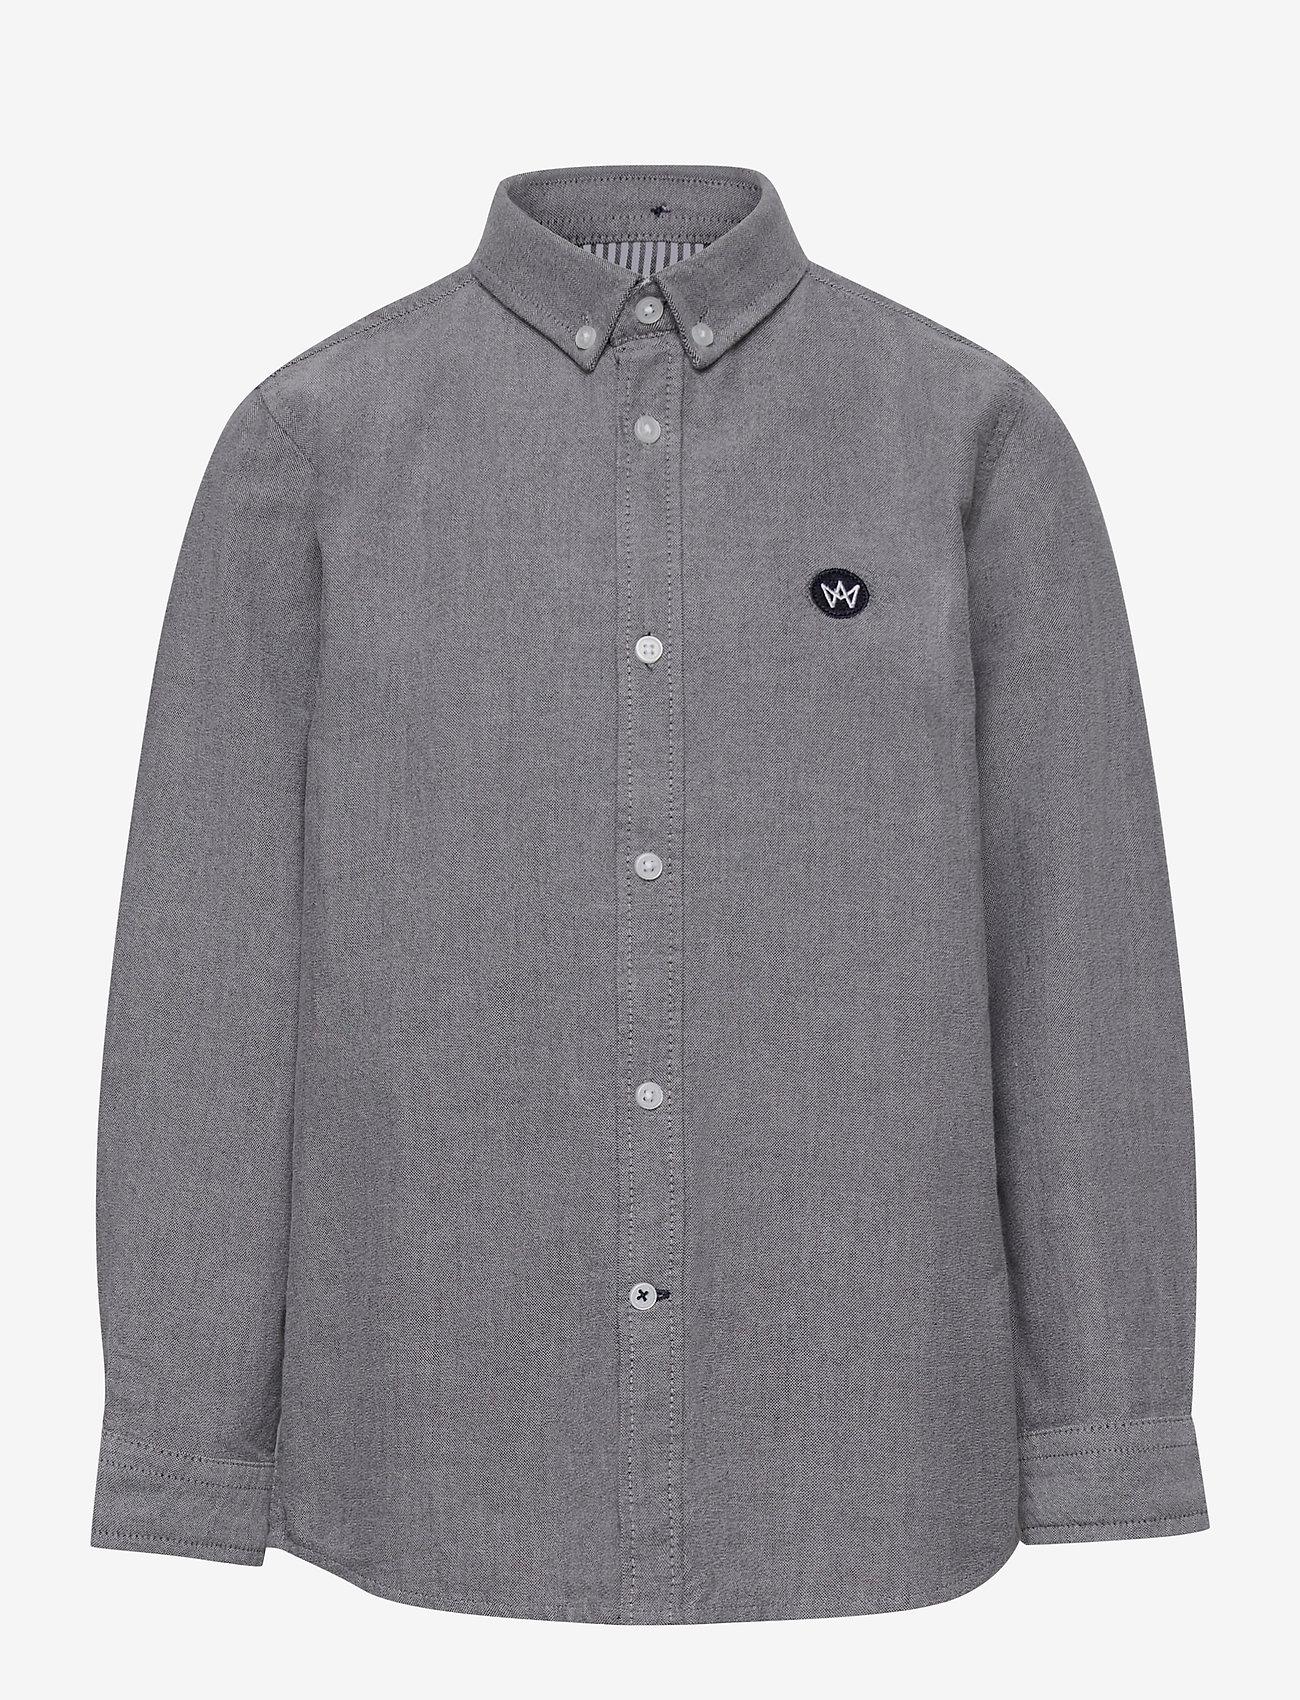 Kronstadt - Johan Oxford shirt - shirts - black - 0